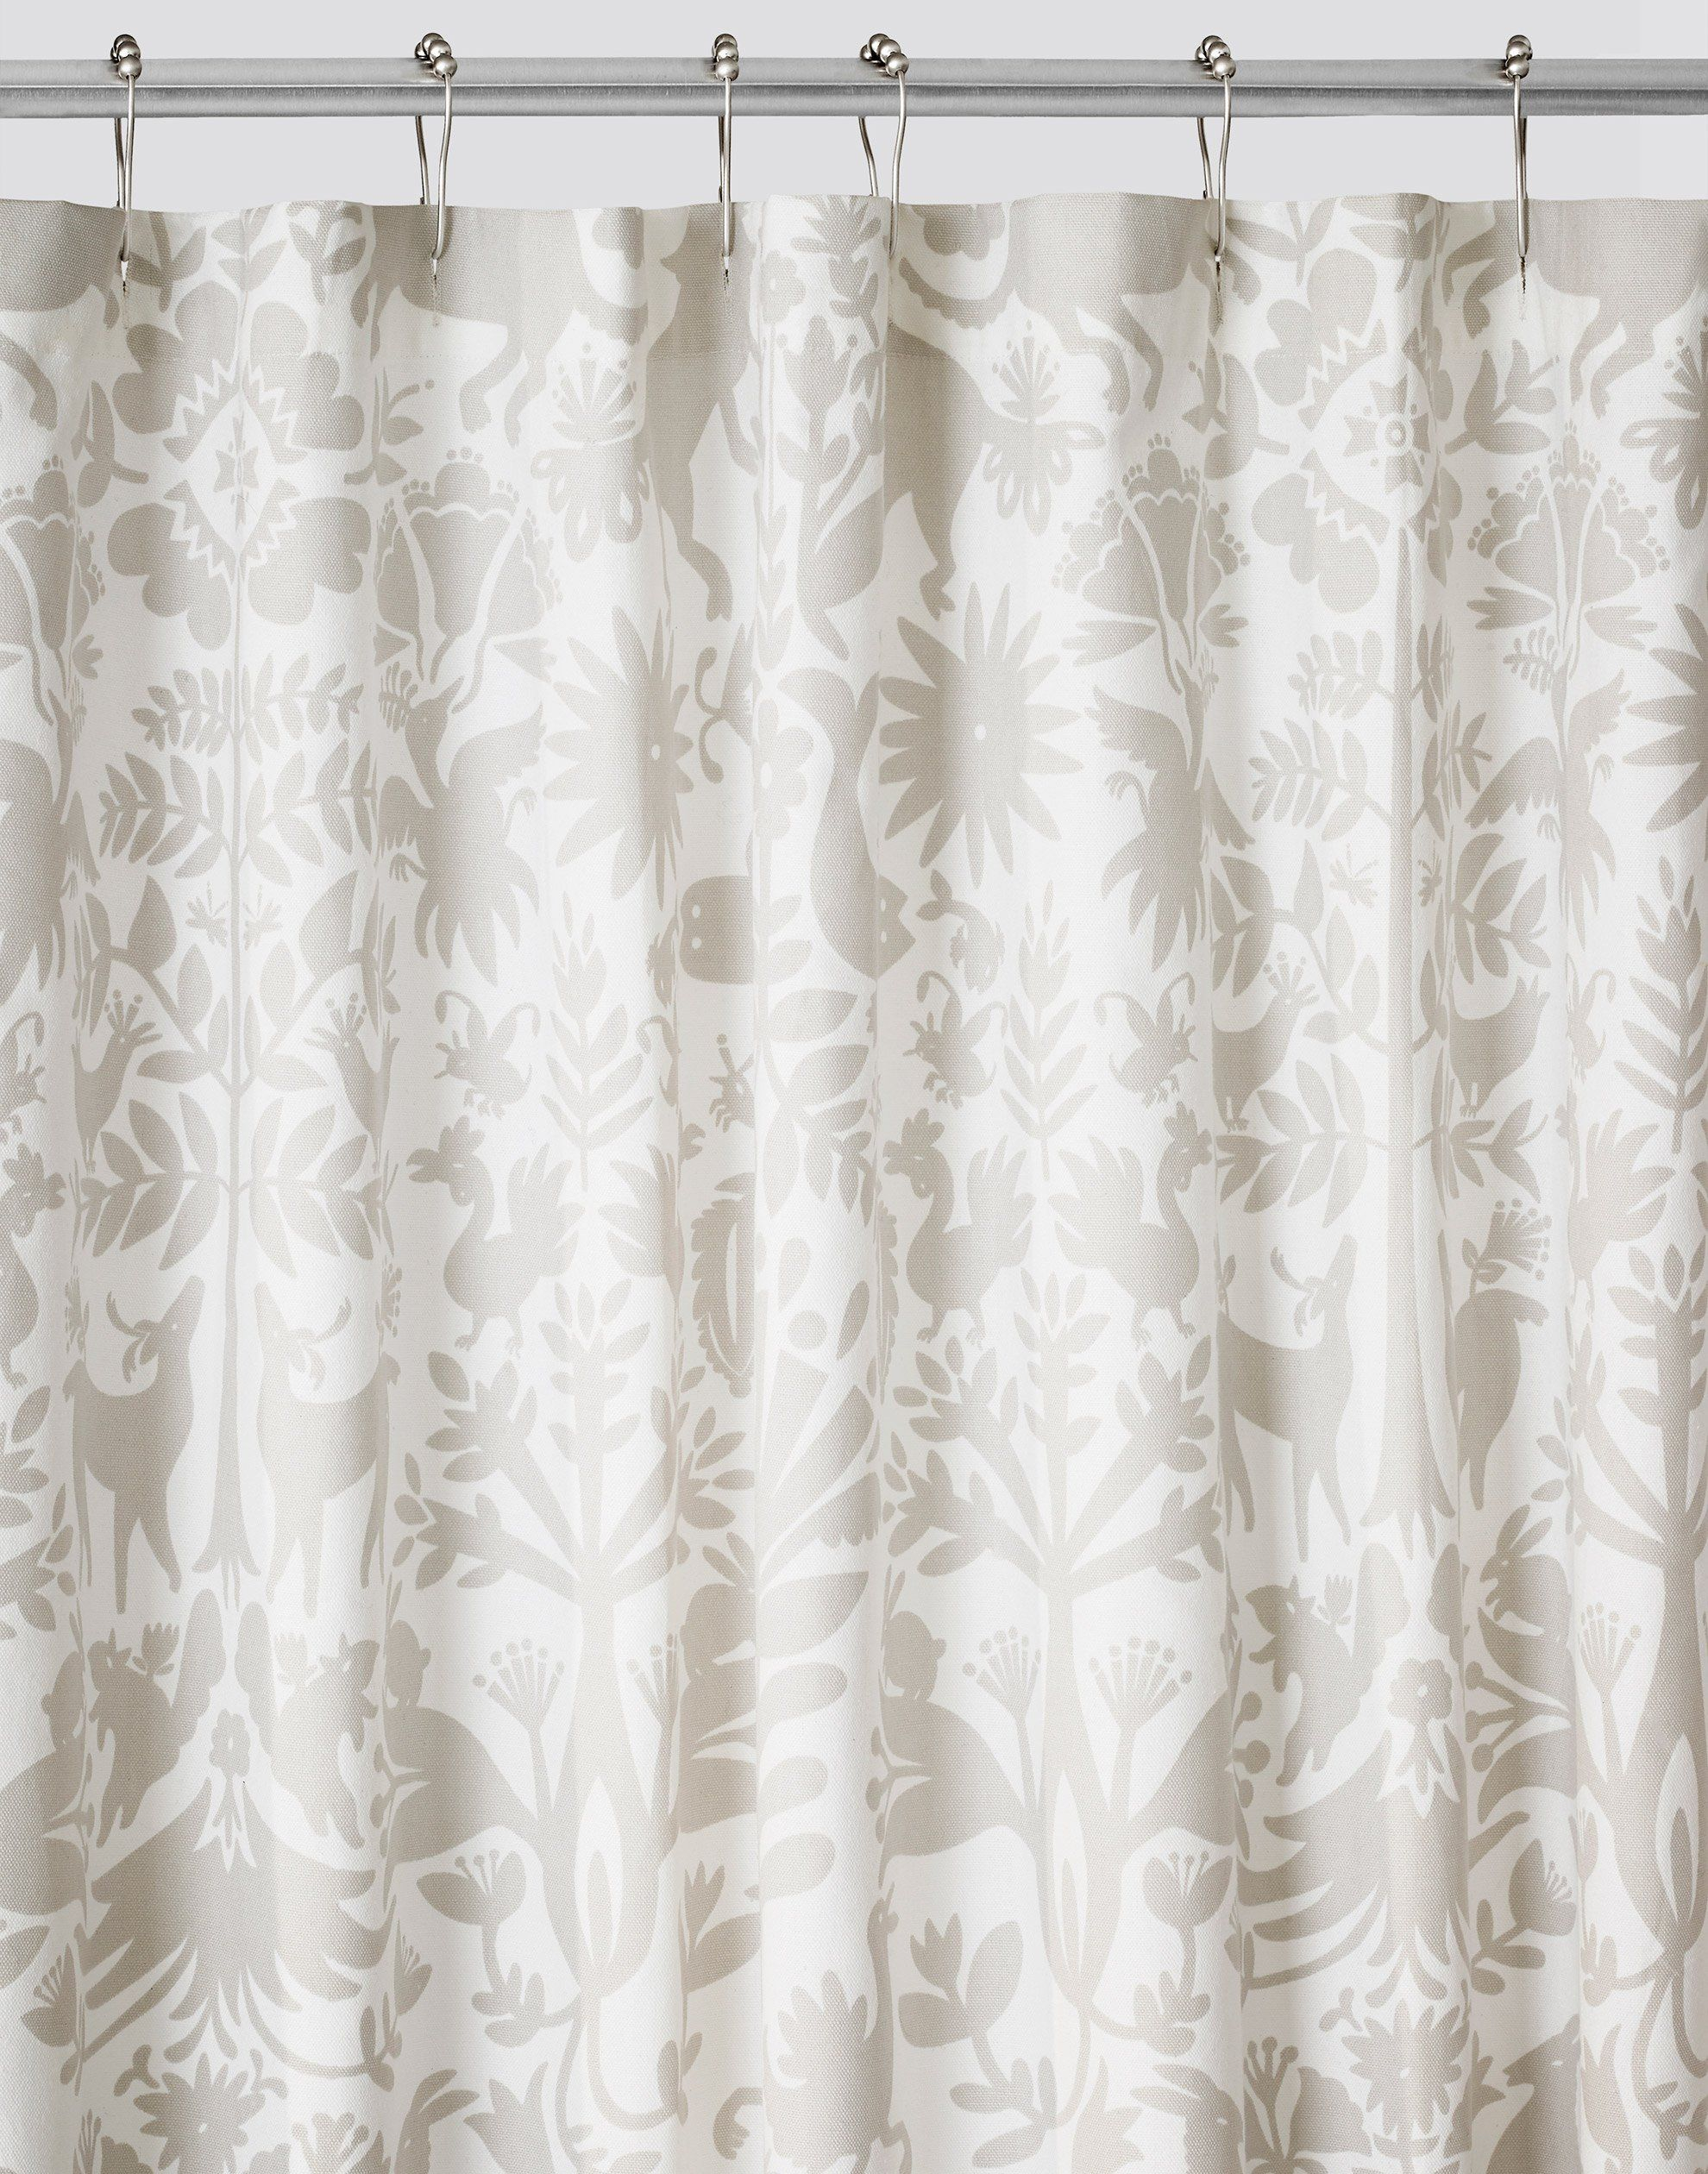 Otomi Pewter Shower Curtain Default Title Silver Shower